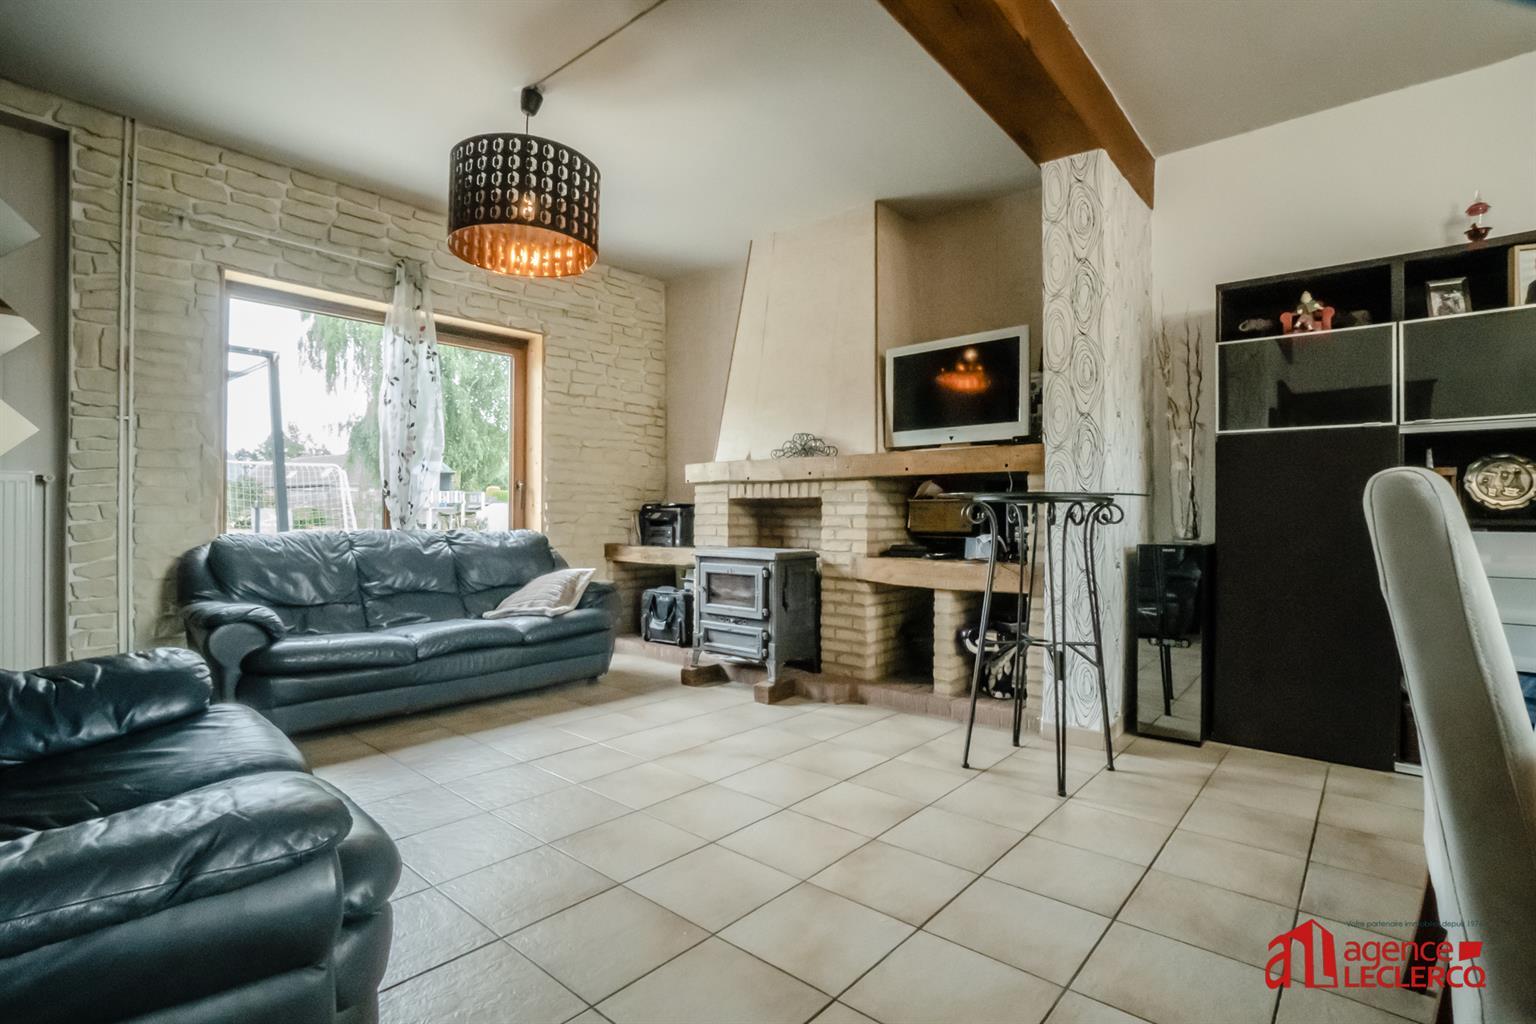 Maison - Gaurain-Ramecroix - #4408184-7